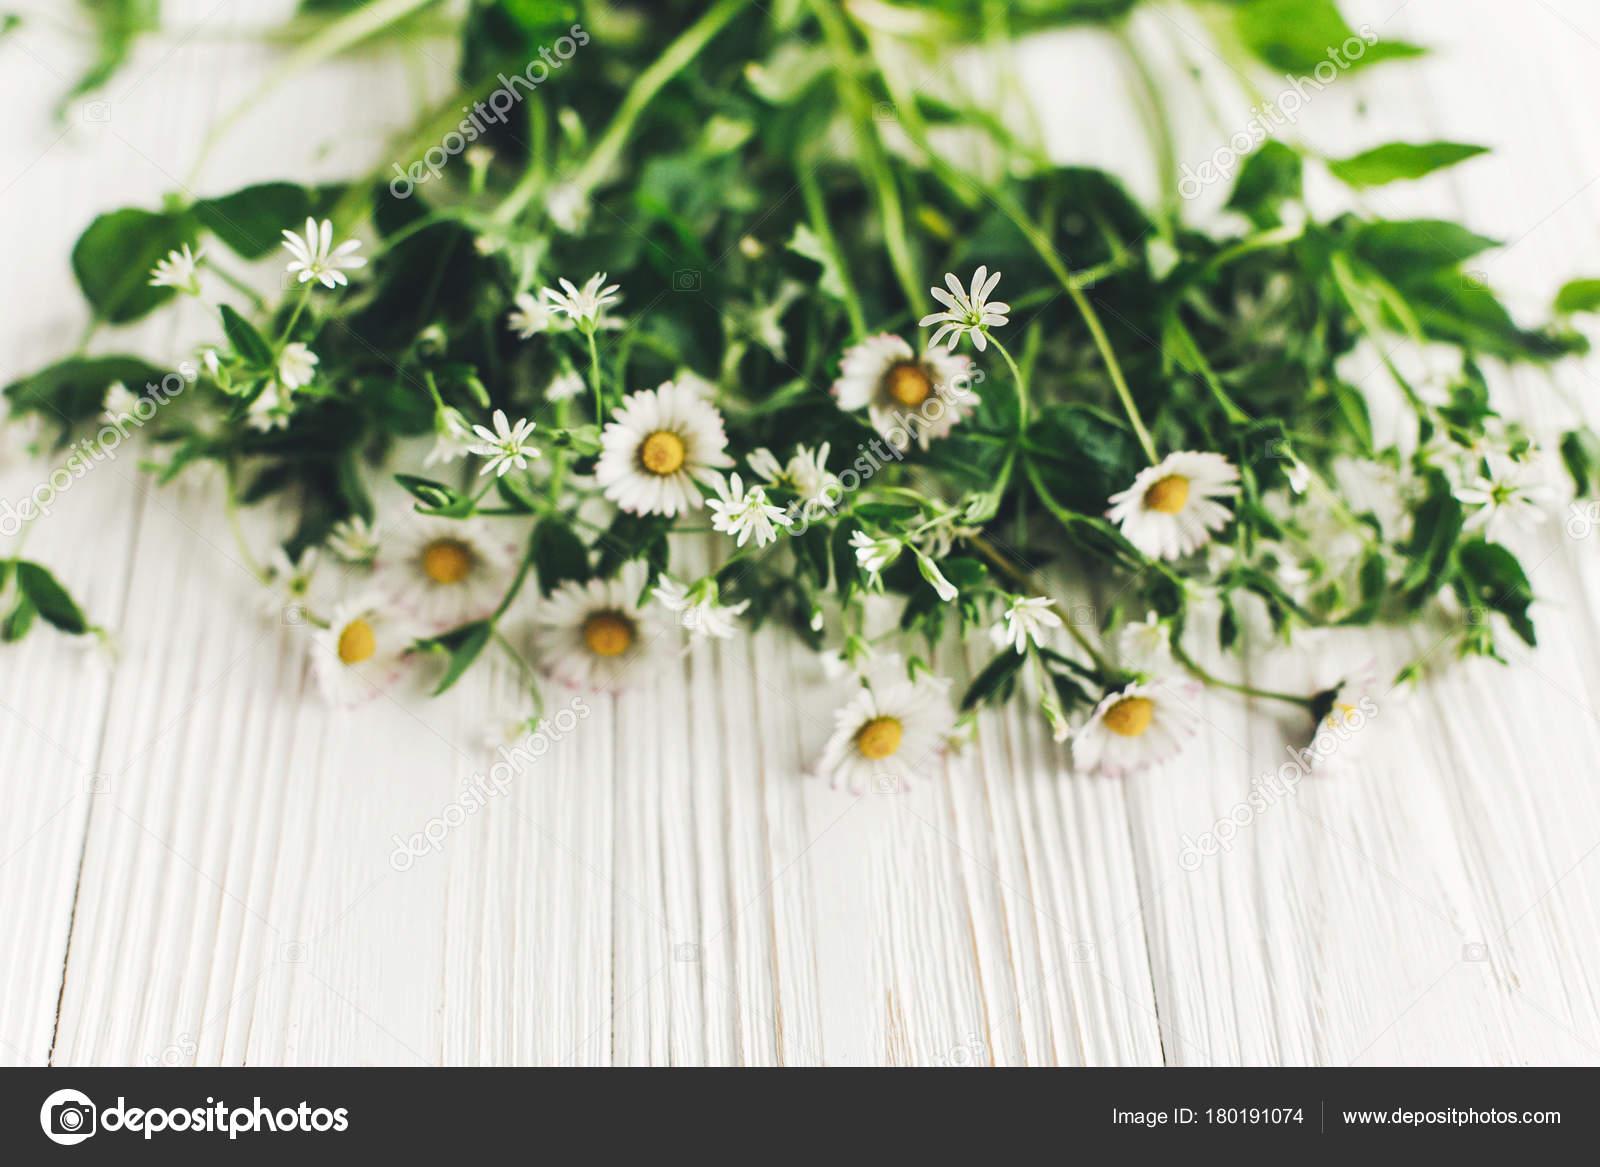 Beautiful daisy flowers greenery white wooden background top view beautiful daisy flowers greenery white wooden background top view copy stock photo izmirmasajfo Choice Image